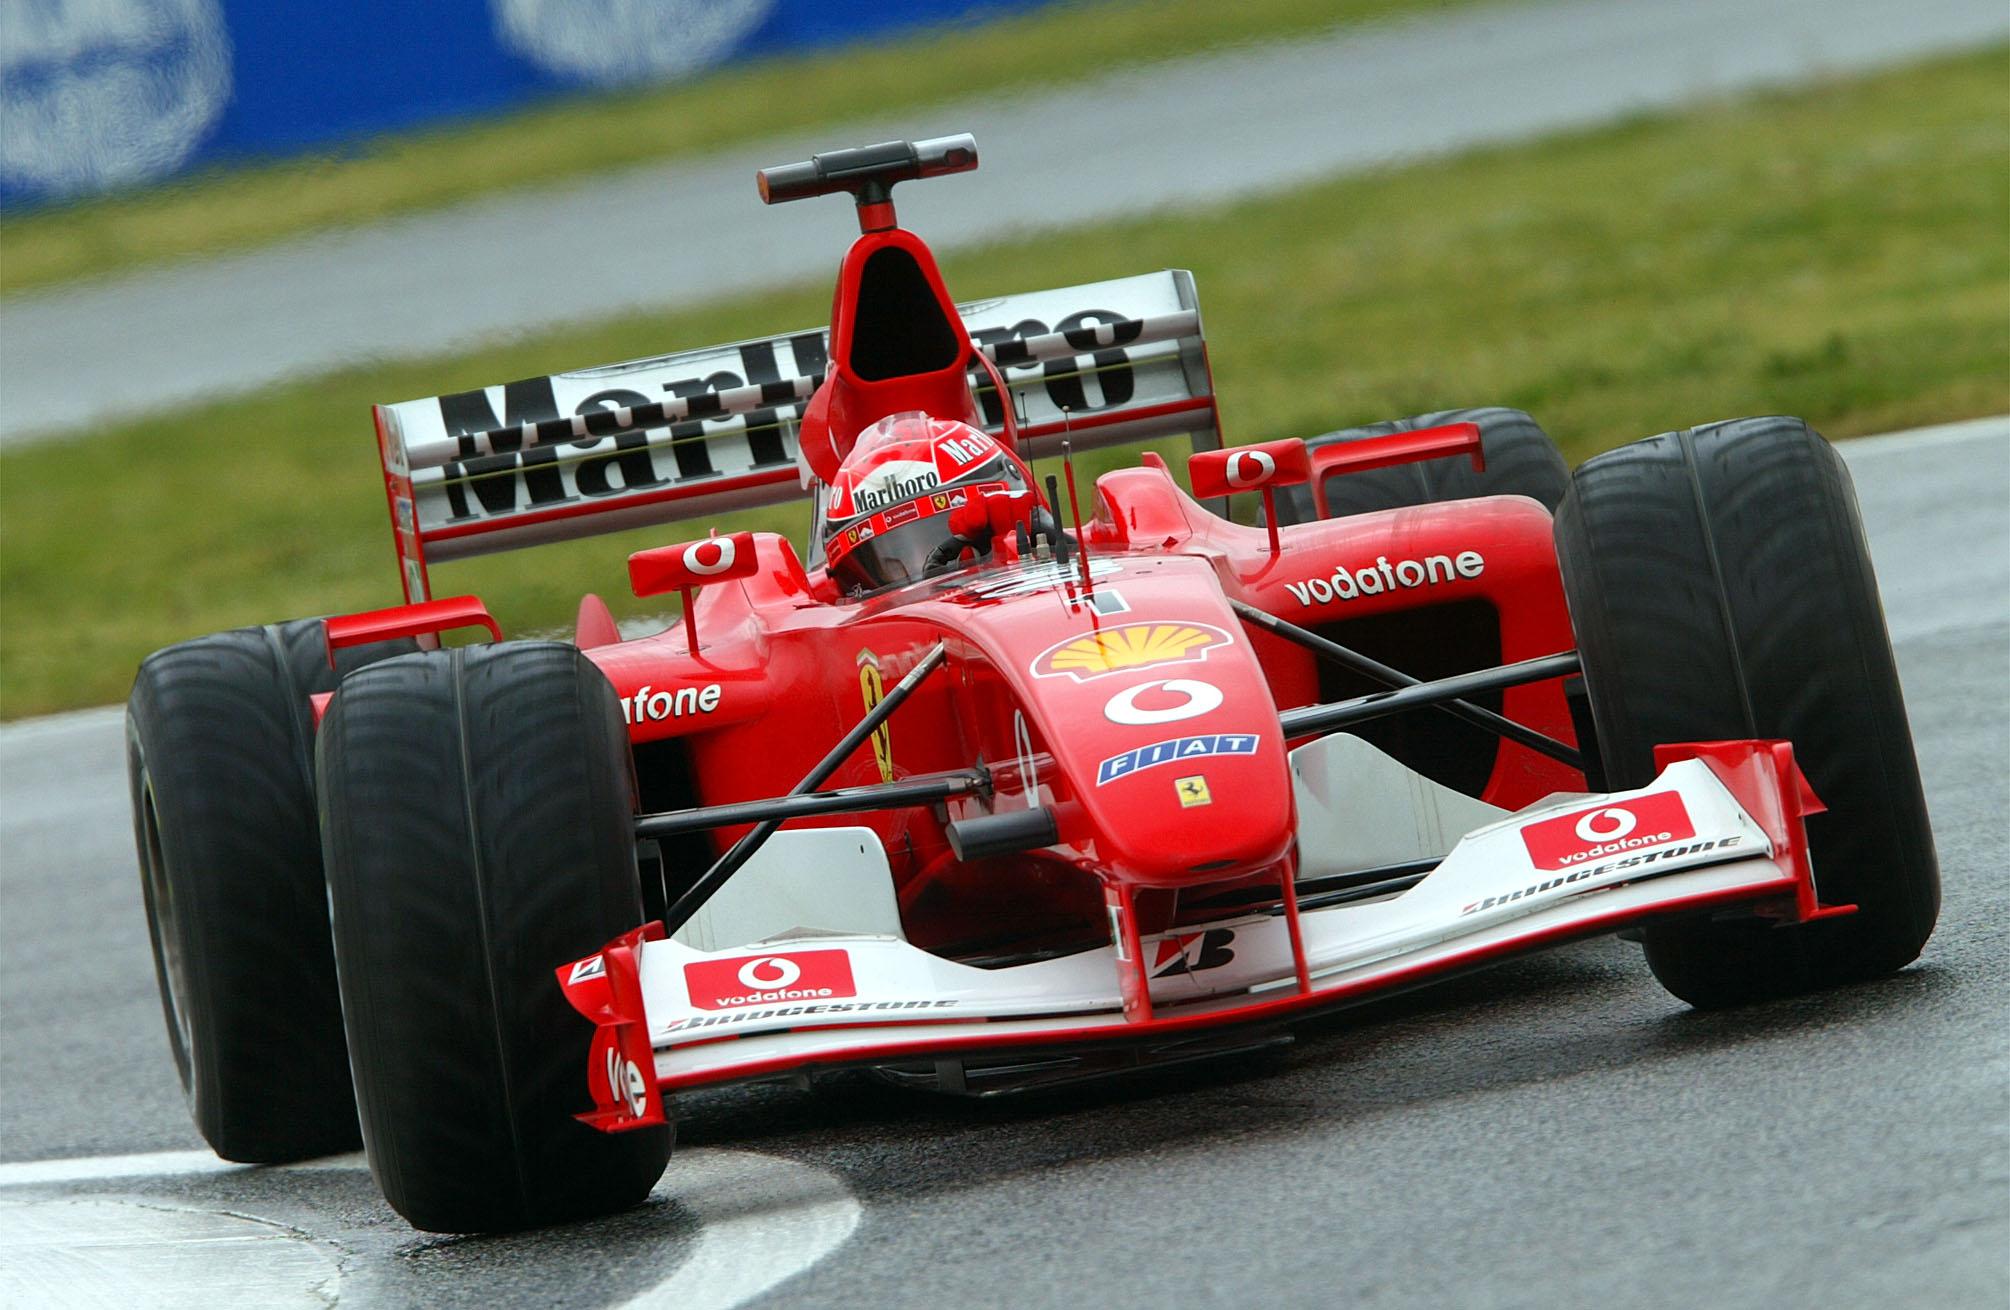 CodePen Tribute To Michael Schumacher